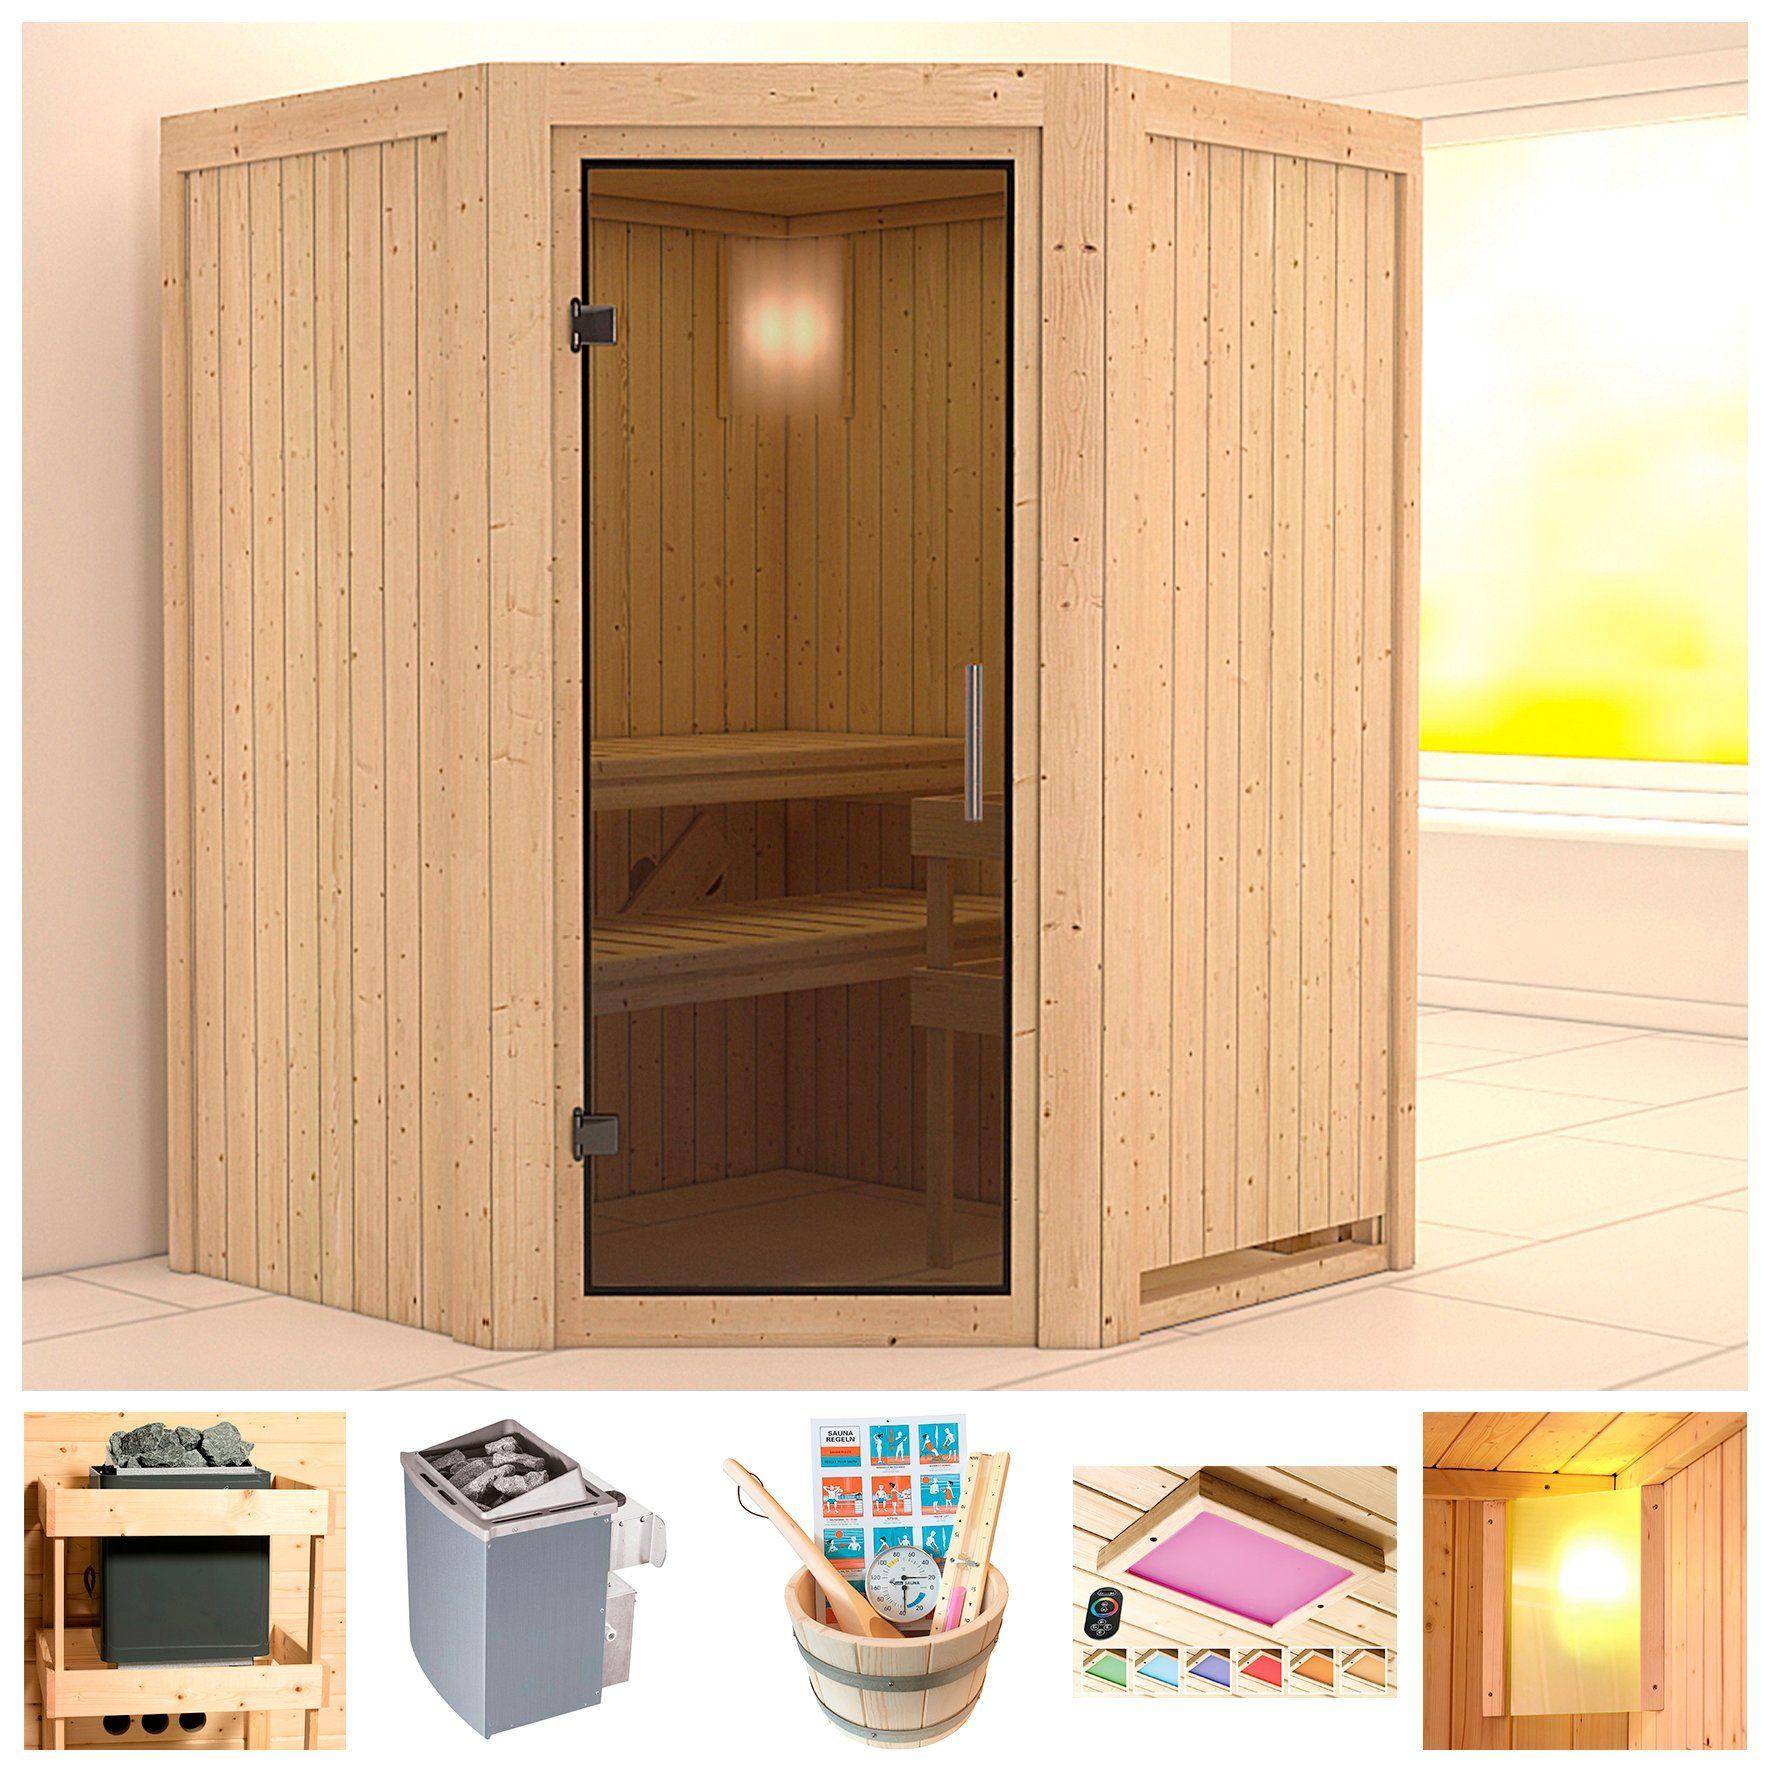 KONIFERA Sauna »Pellworm«, 151x151x198 cm, 9-kW-Ofen mit int. Steuerung